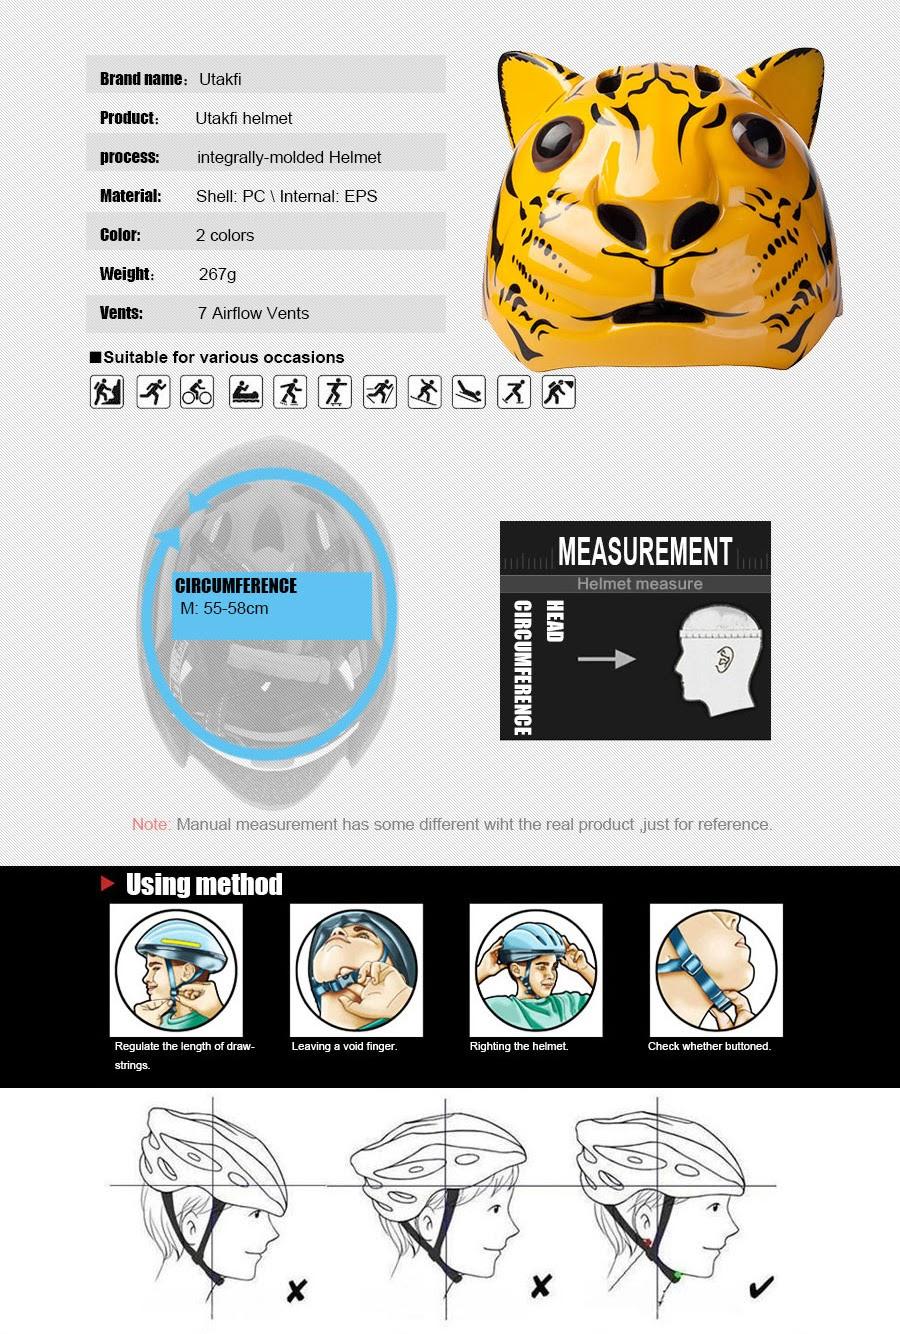 Nón bảo hiểm Tiger Utakfi 7